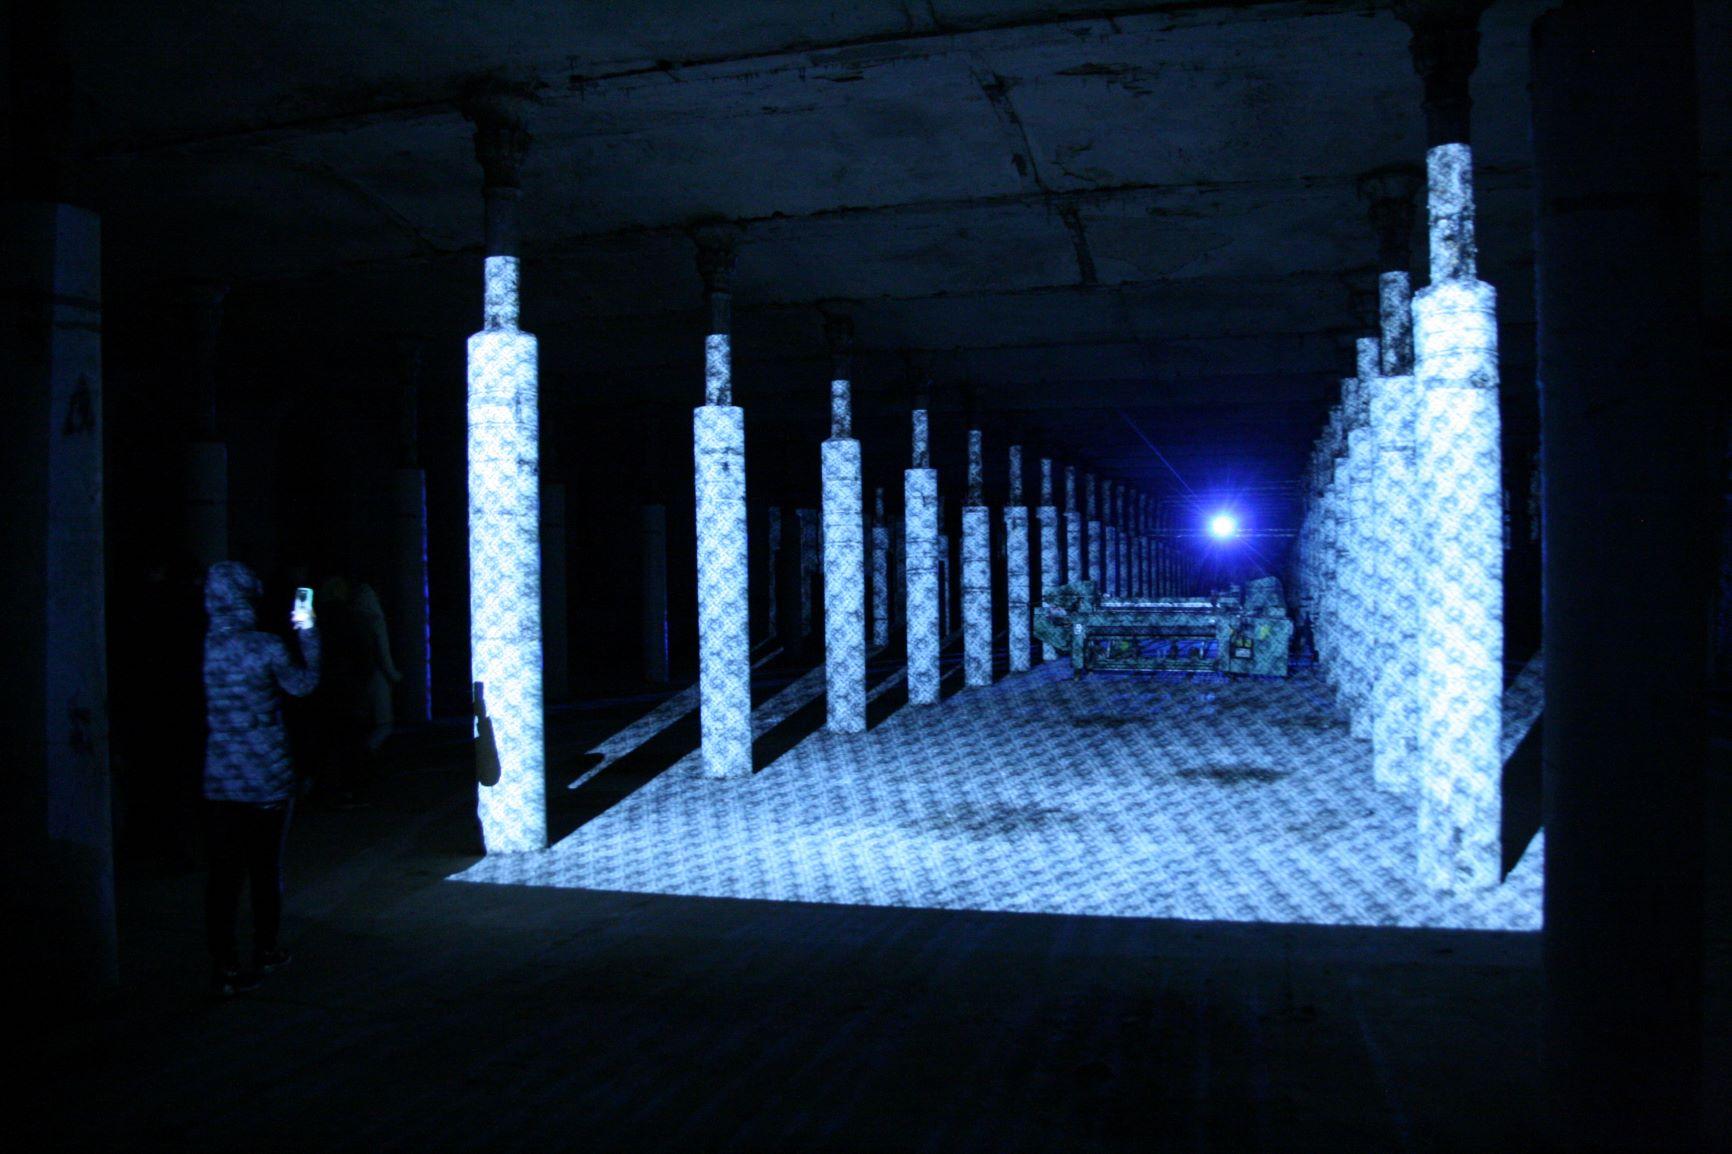 Kreenholmi valgusmatk. Foto: Theodorus Lethe